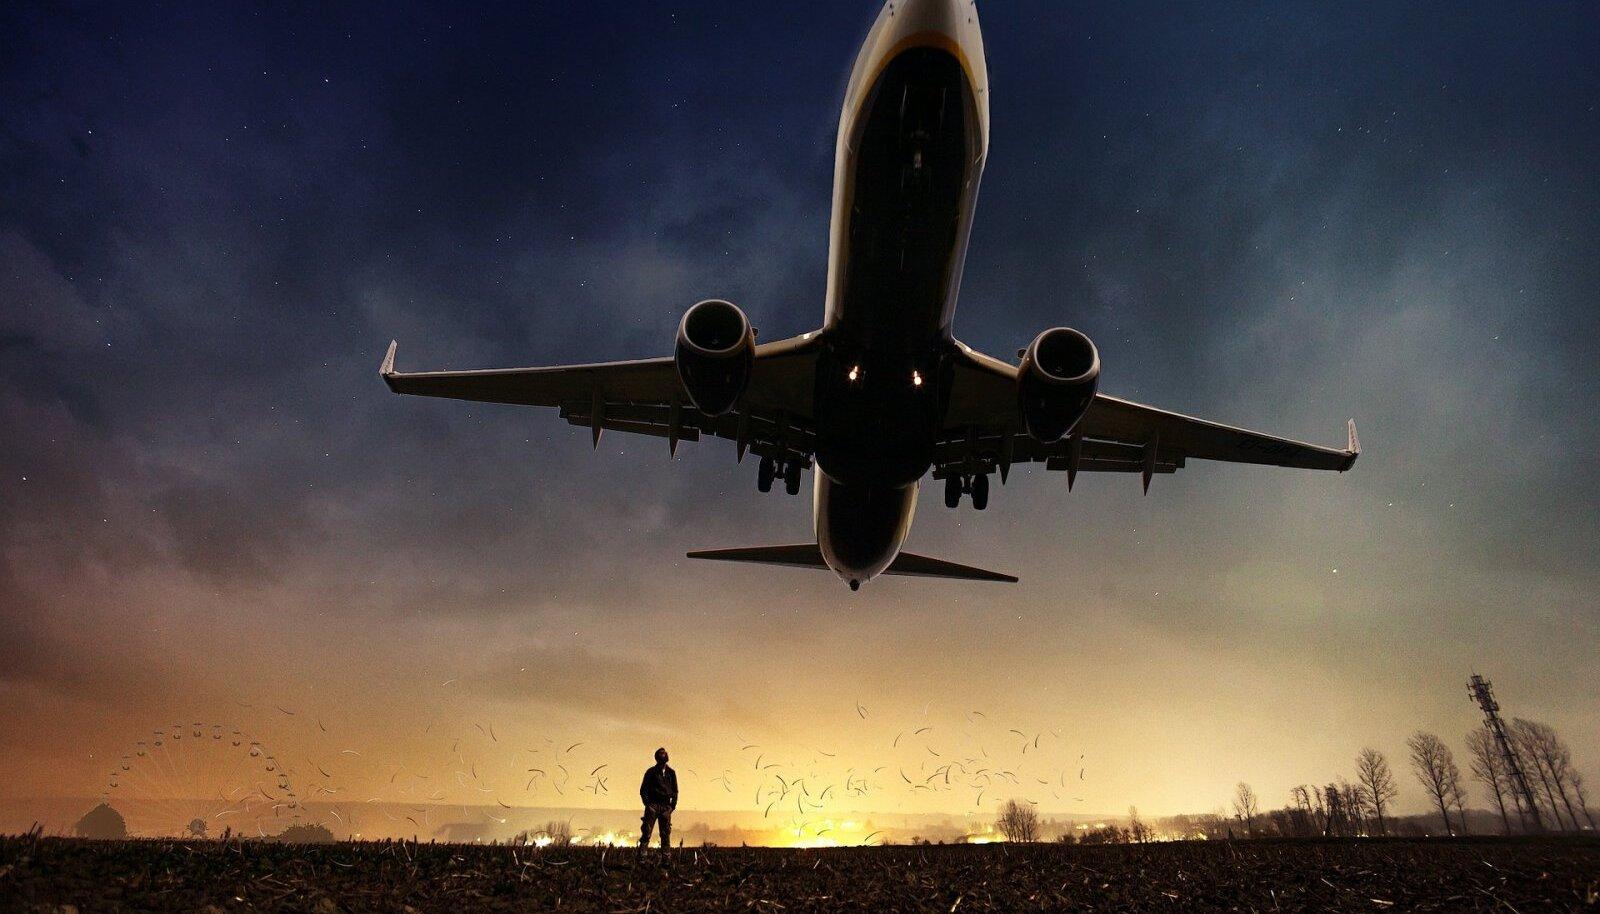 Illustratiivne pilt reisilennukist (Foto: Pixabay / ThePixelman)